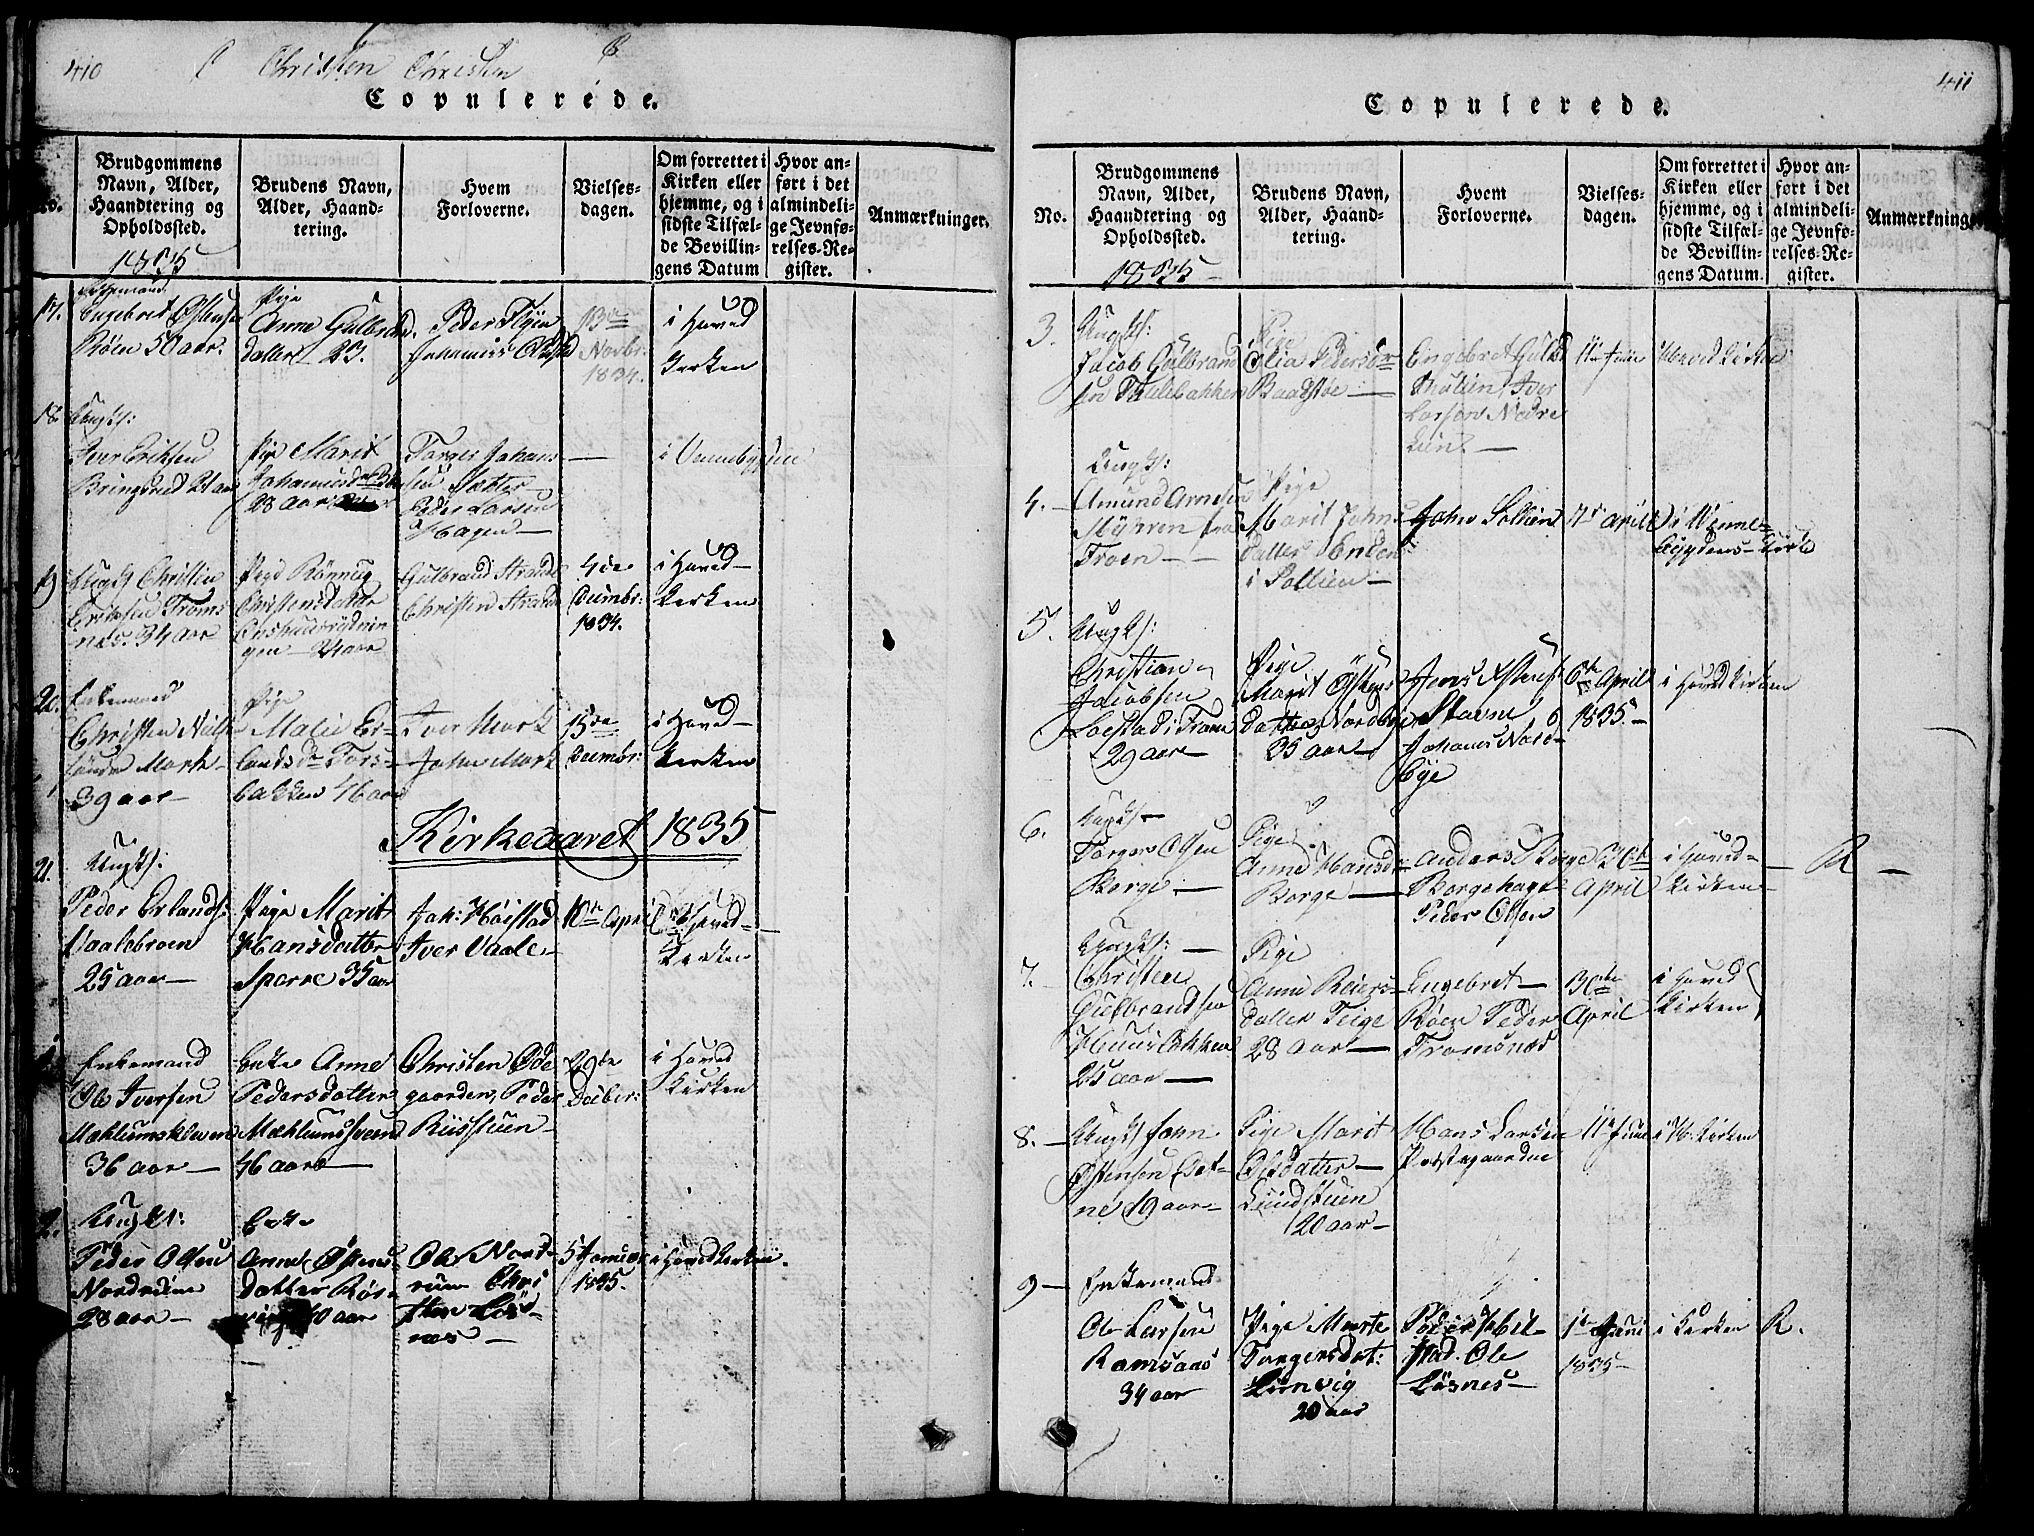 SAH, Ringebu prestekontor, Klokkerbok nr. 1, 1821-1839, s. 410-411